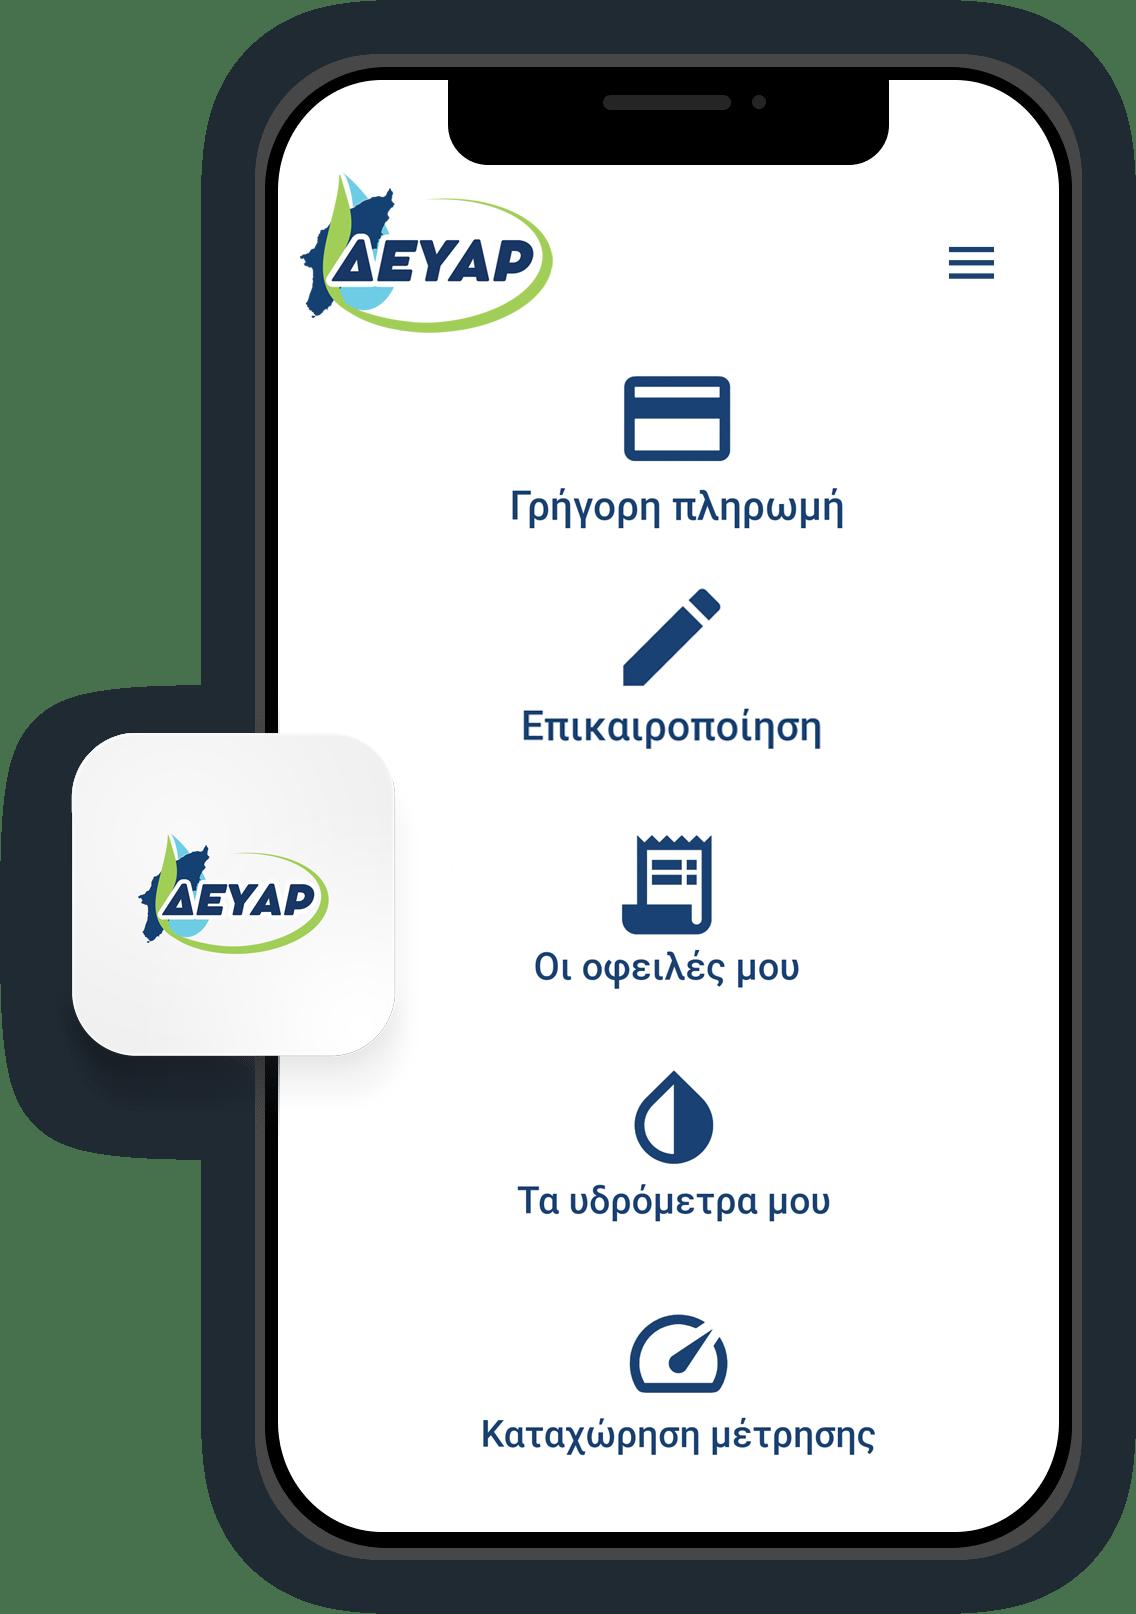 my deyar - Mobile App